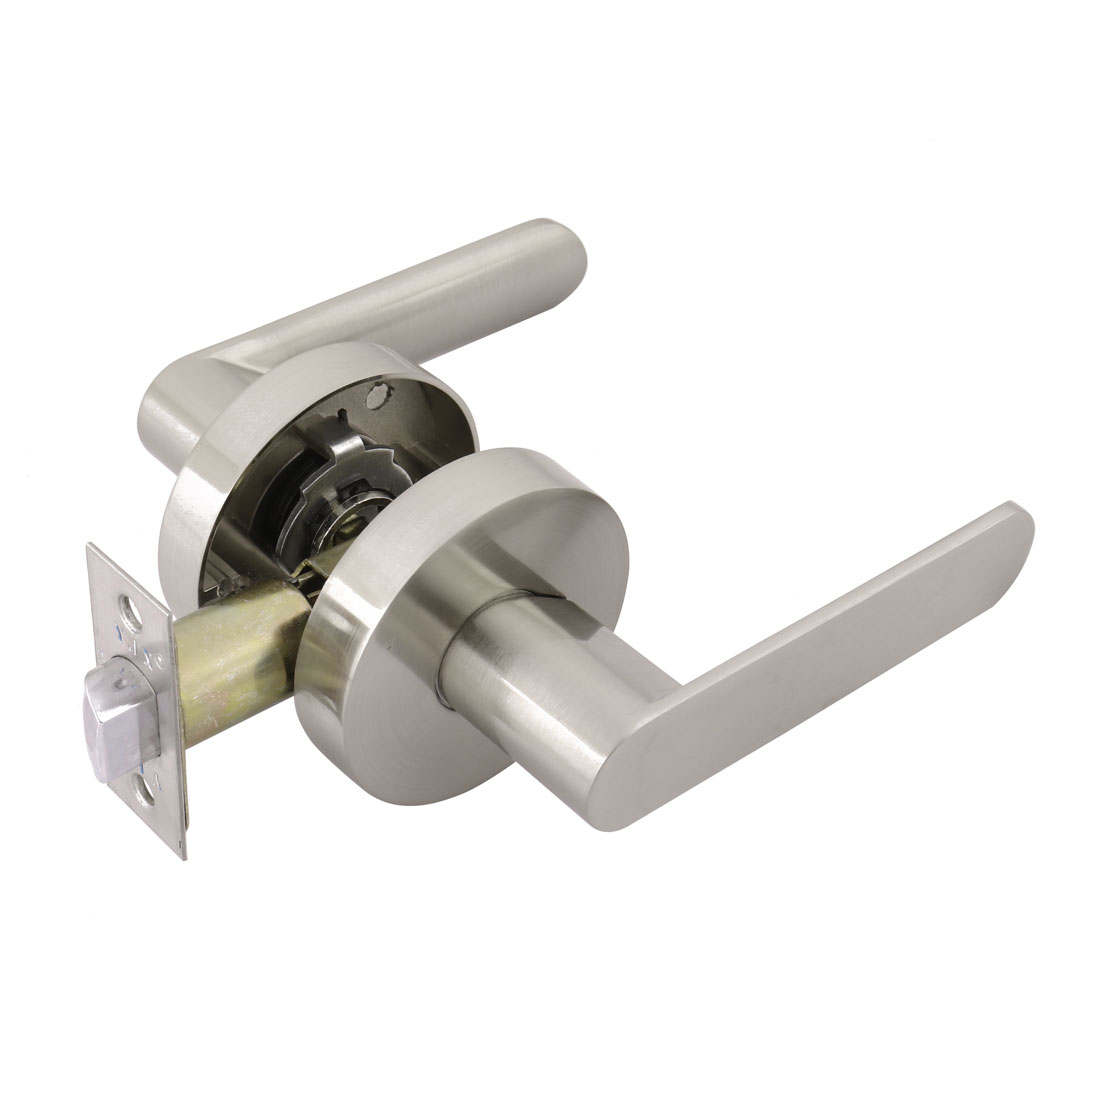 Passage Hallway Door Lock Set Lockset Lever Handle with Round Style Rose - image 7 of 7